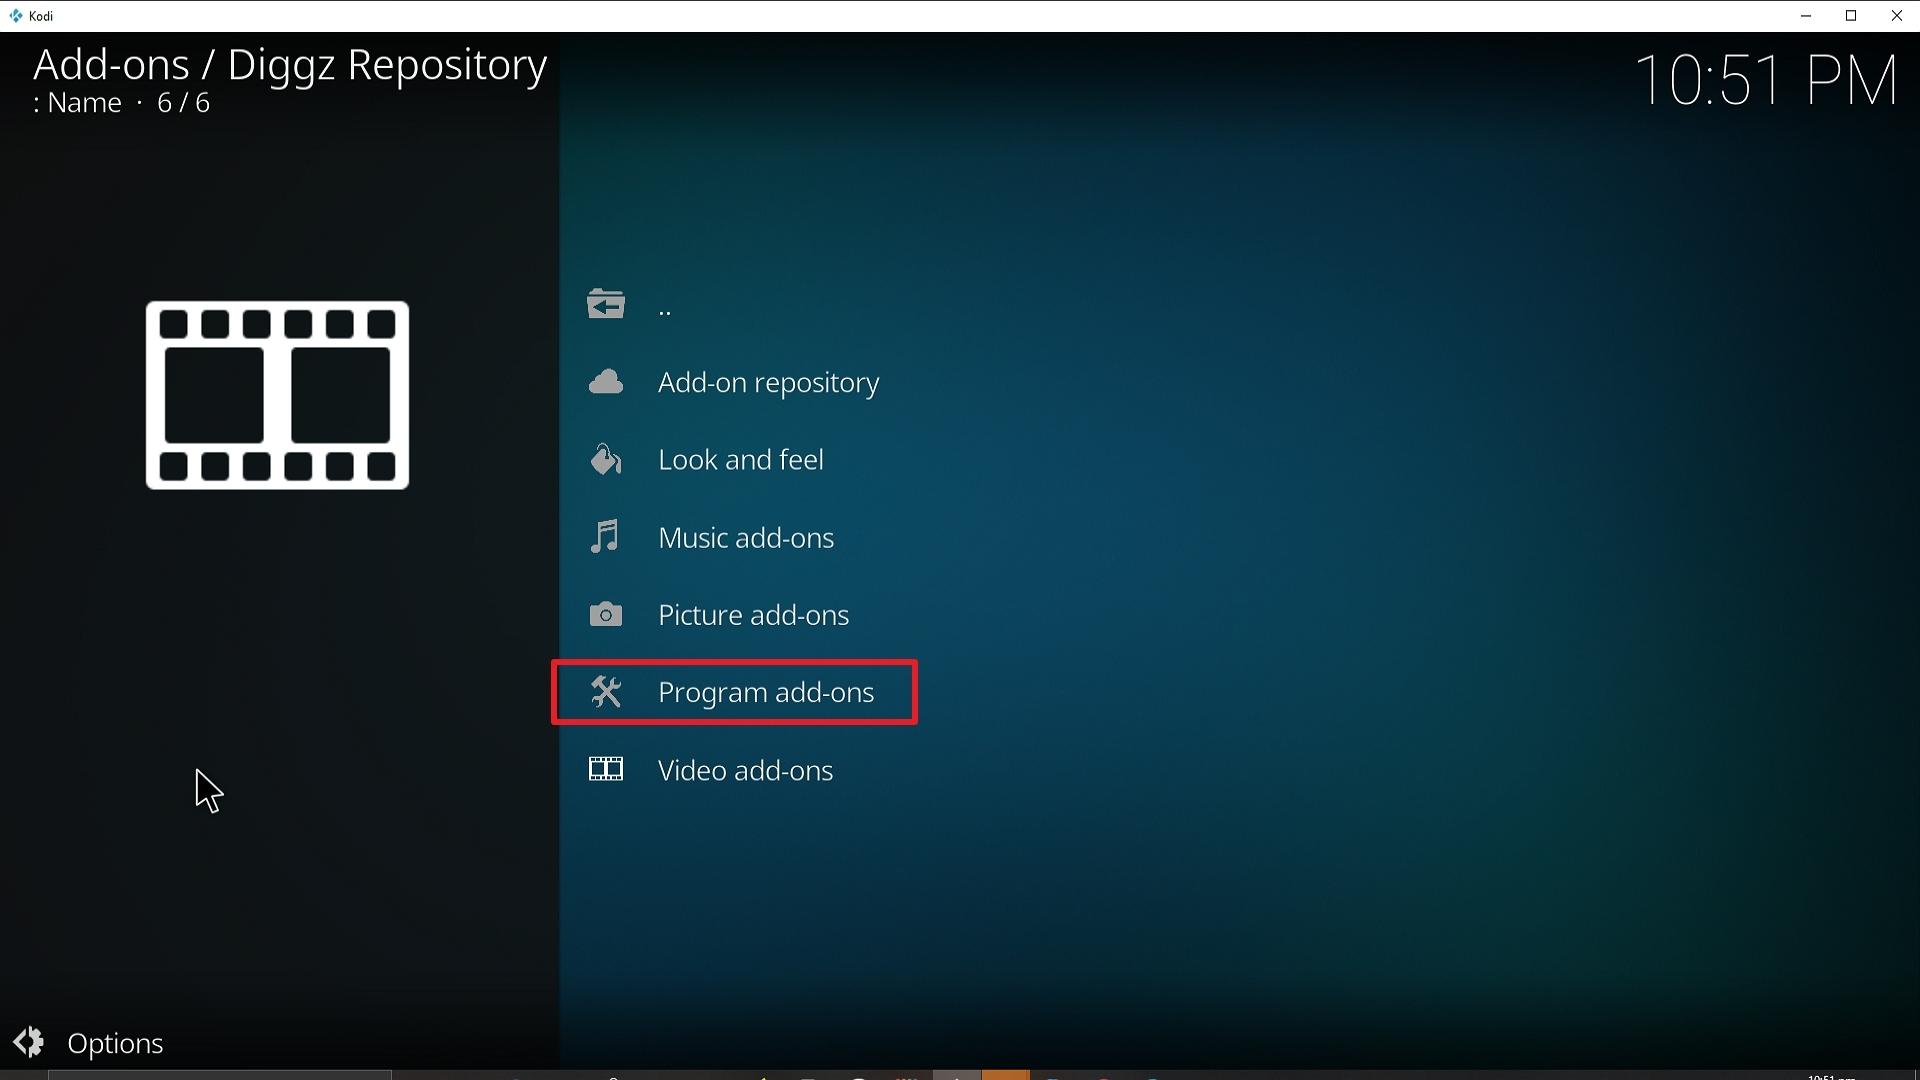 Step 22 Installing Diggz Xenon addon on Kodi